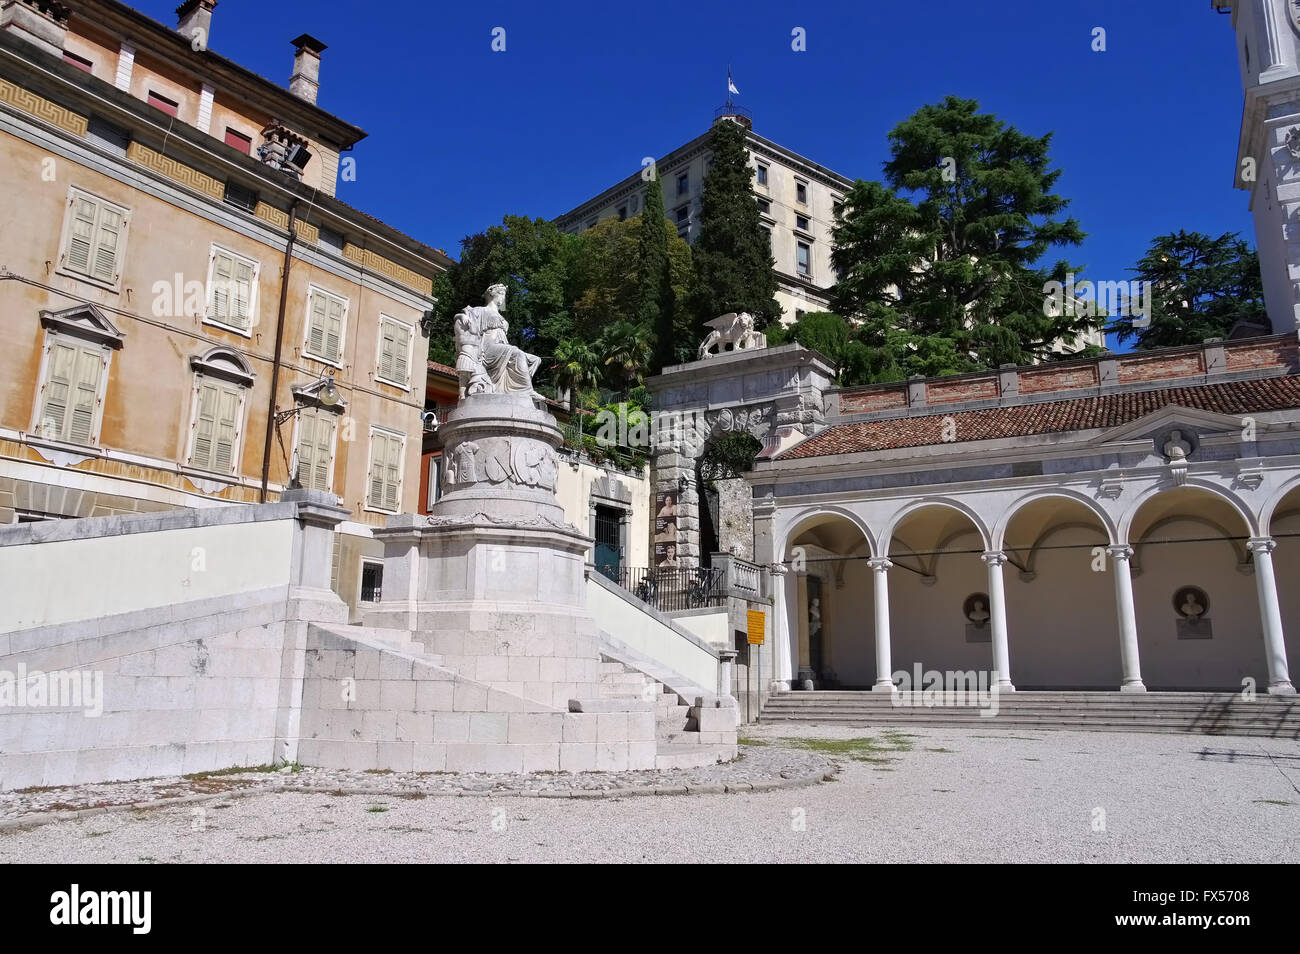 Udine Piazza della Liberta im Zentrum - Udine, Udine Piazza della Liberta in the city - Stock Image